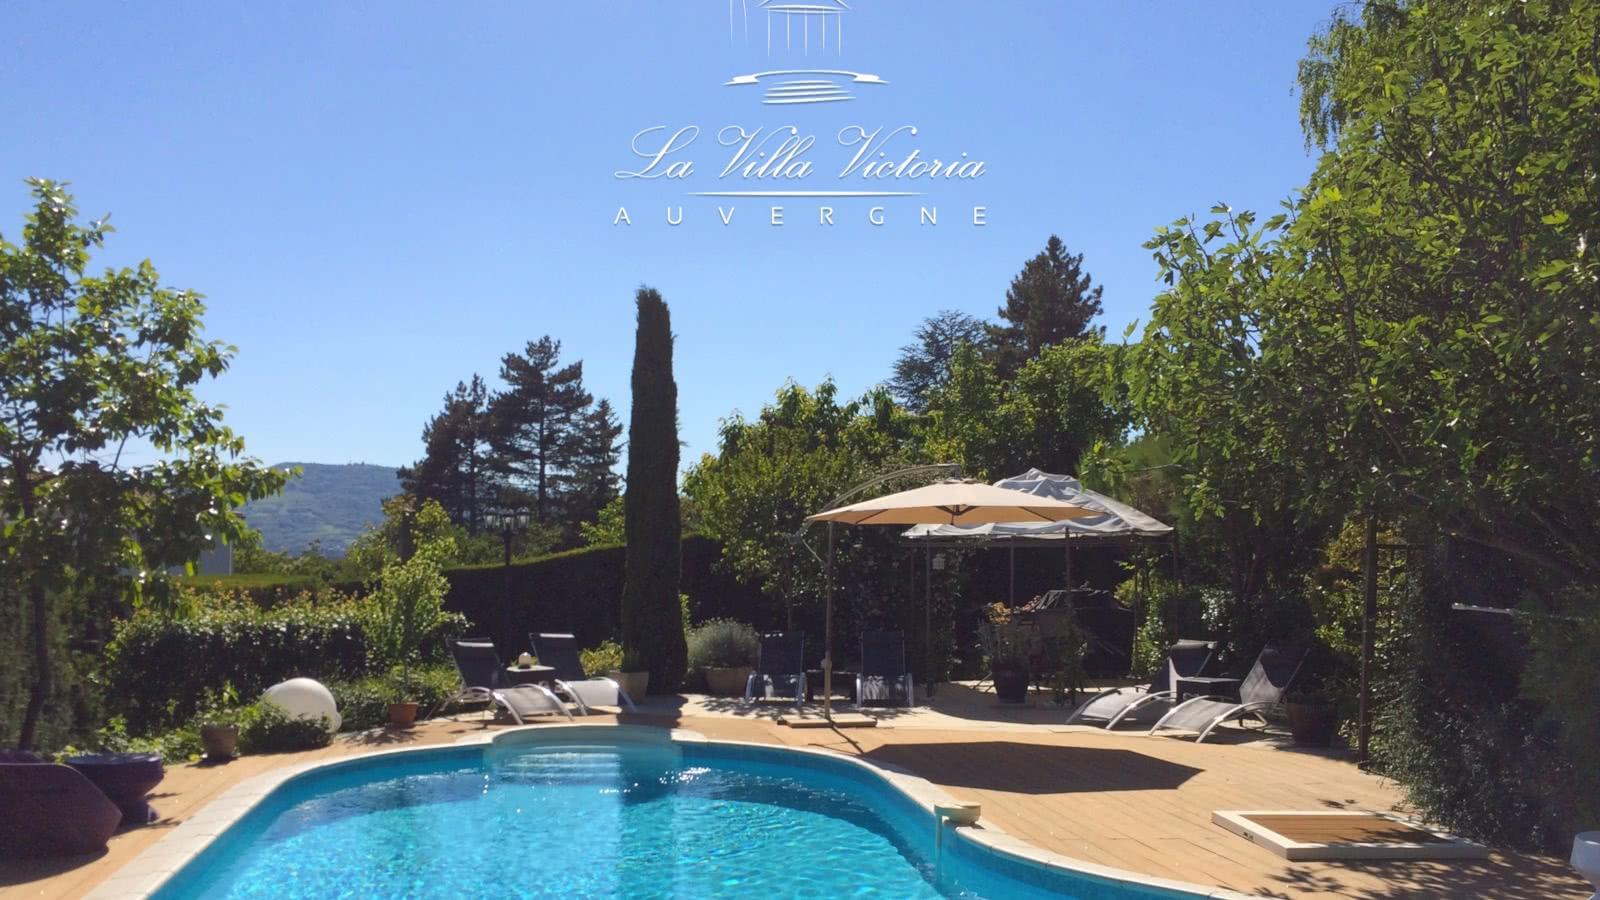 La Villa Victoria Auvergne - Clermont Auvergne Tourisme dedans Piscine Cournon